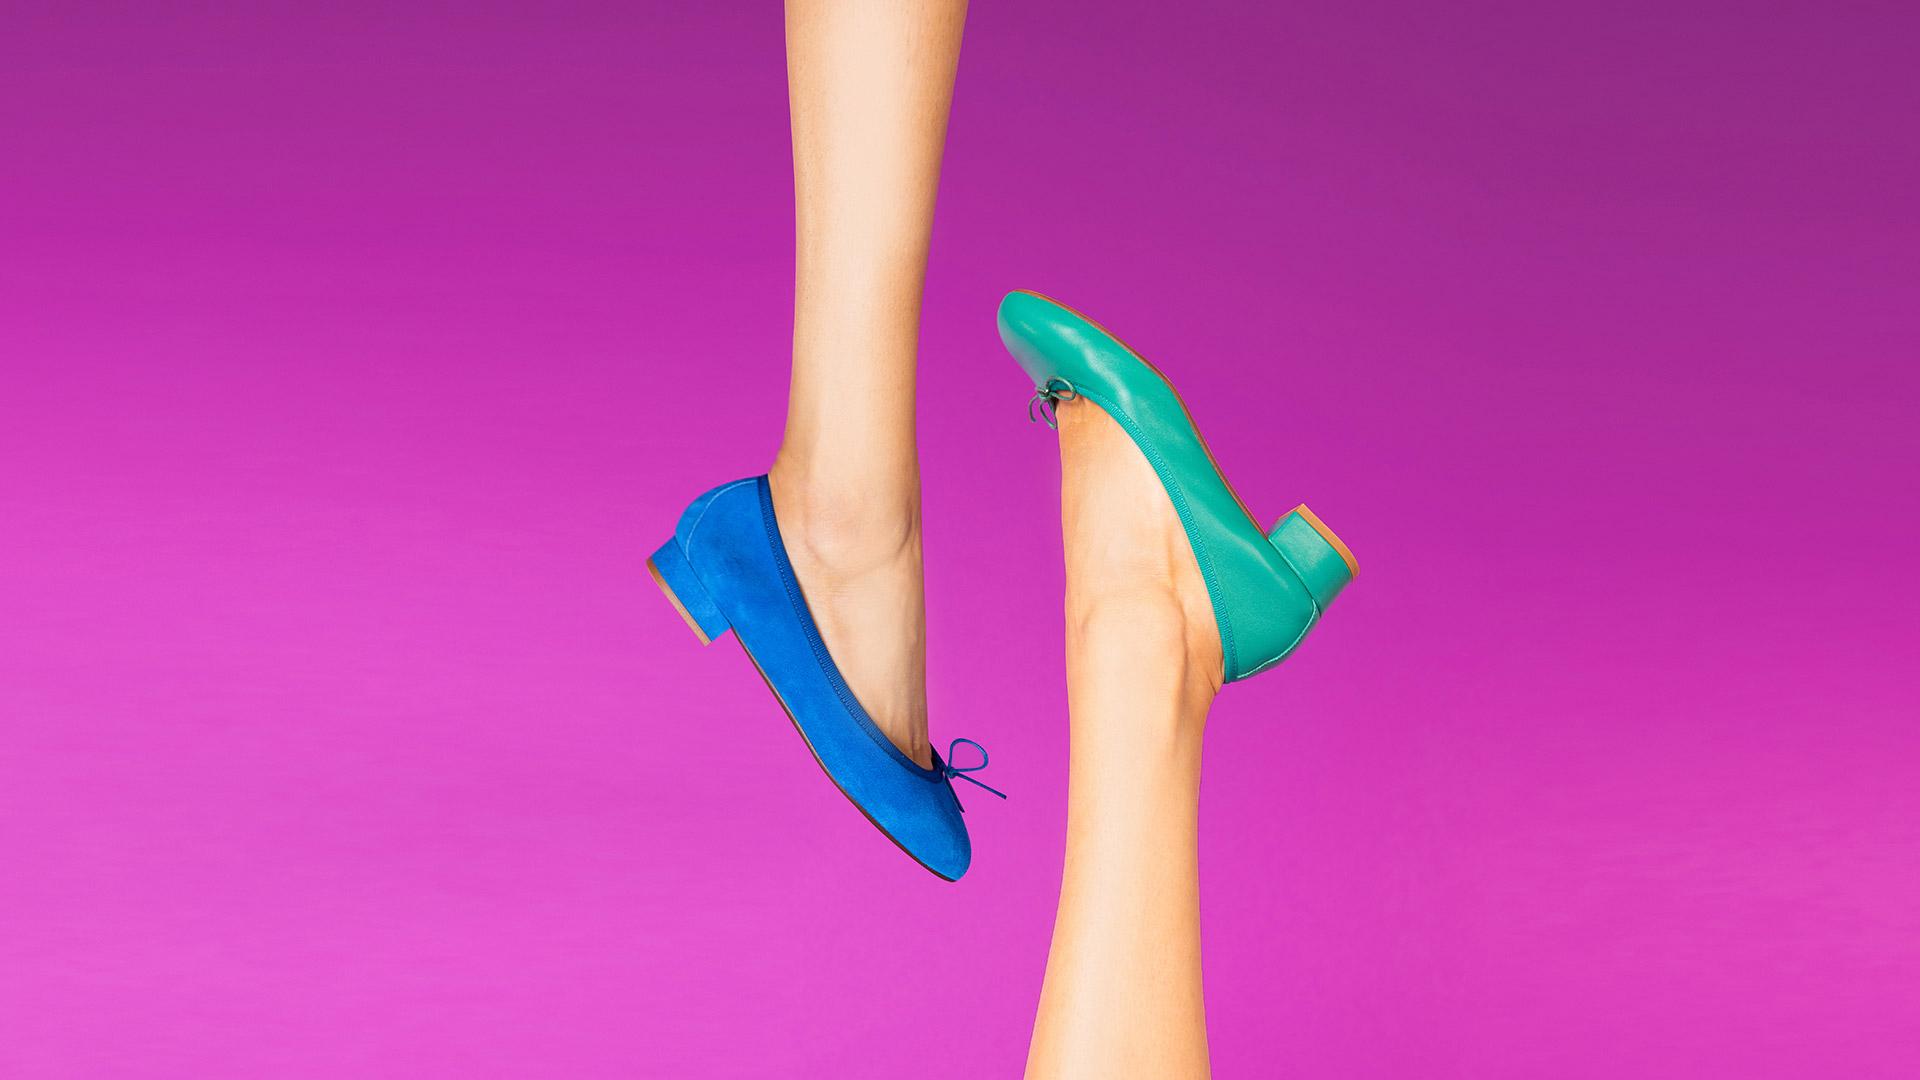 Classic ballet flats with heels